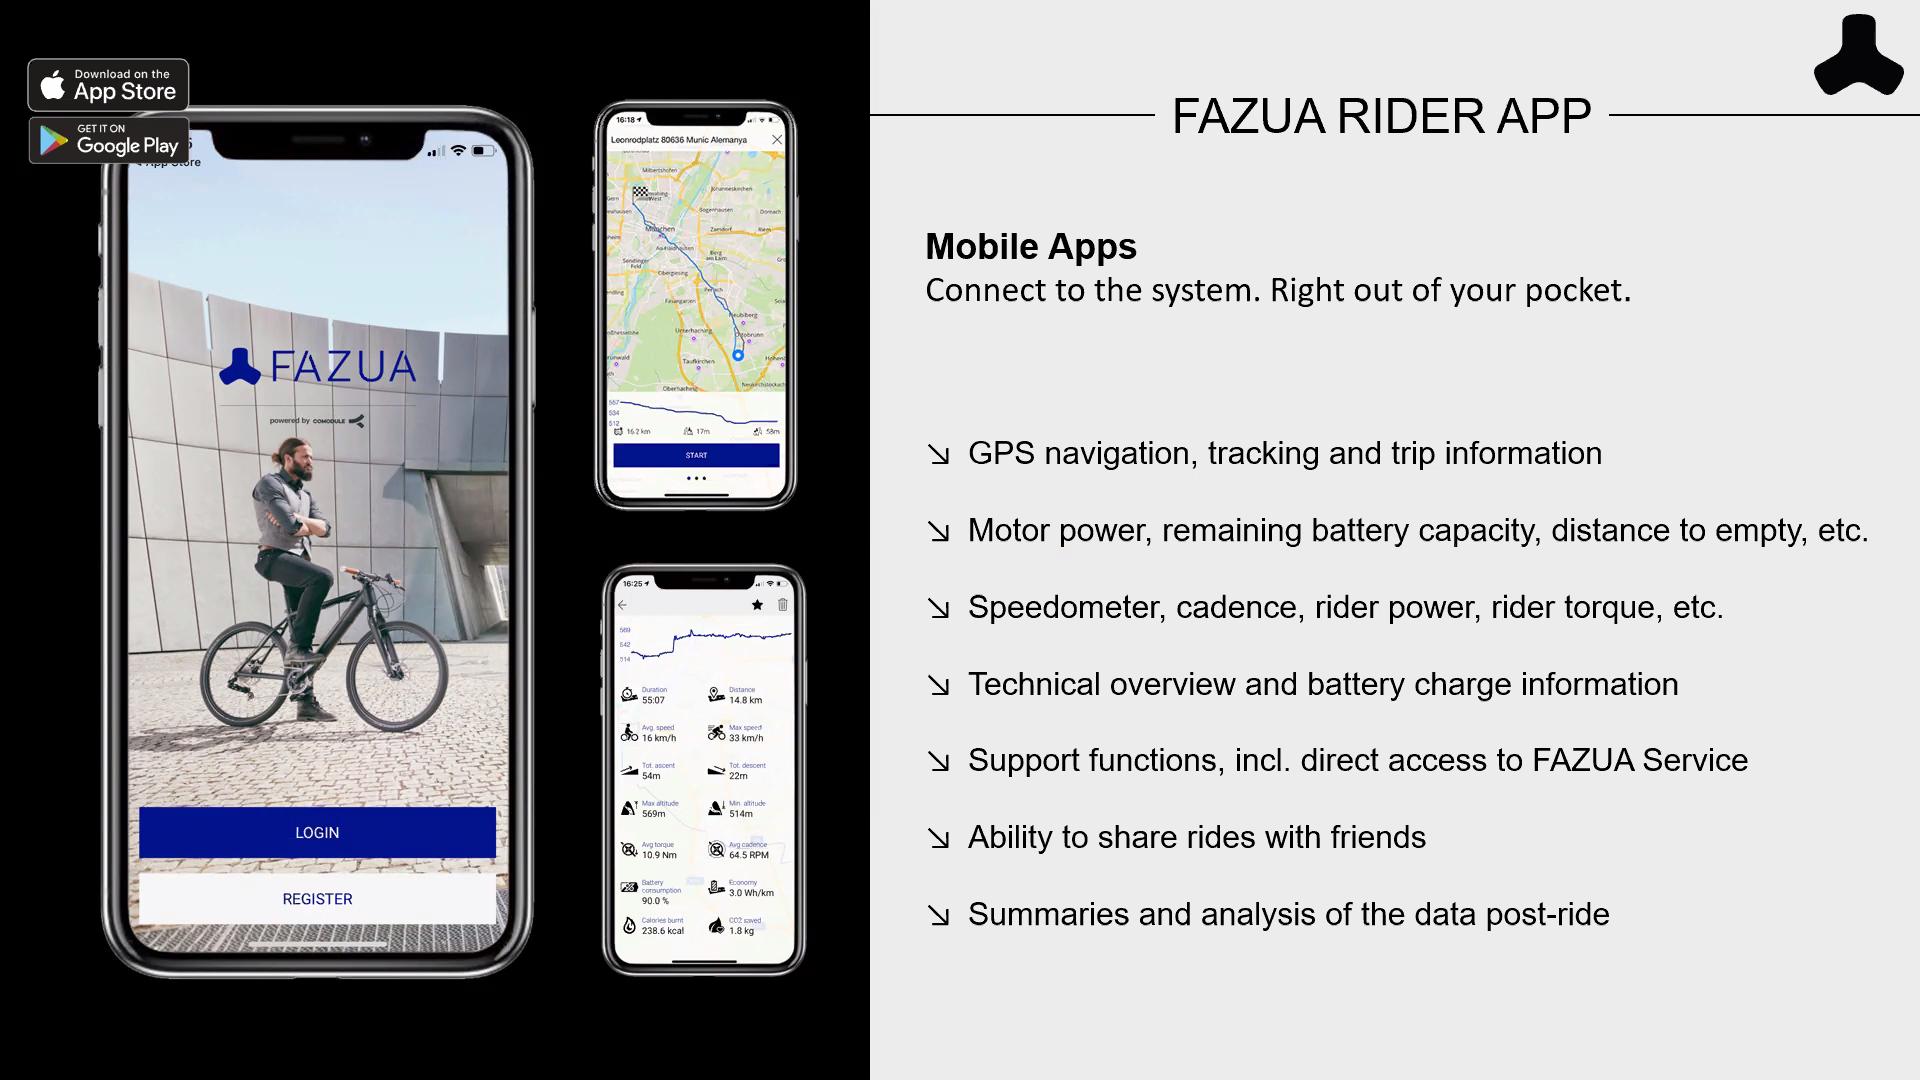 Fazua Rider Mobile App